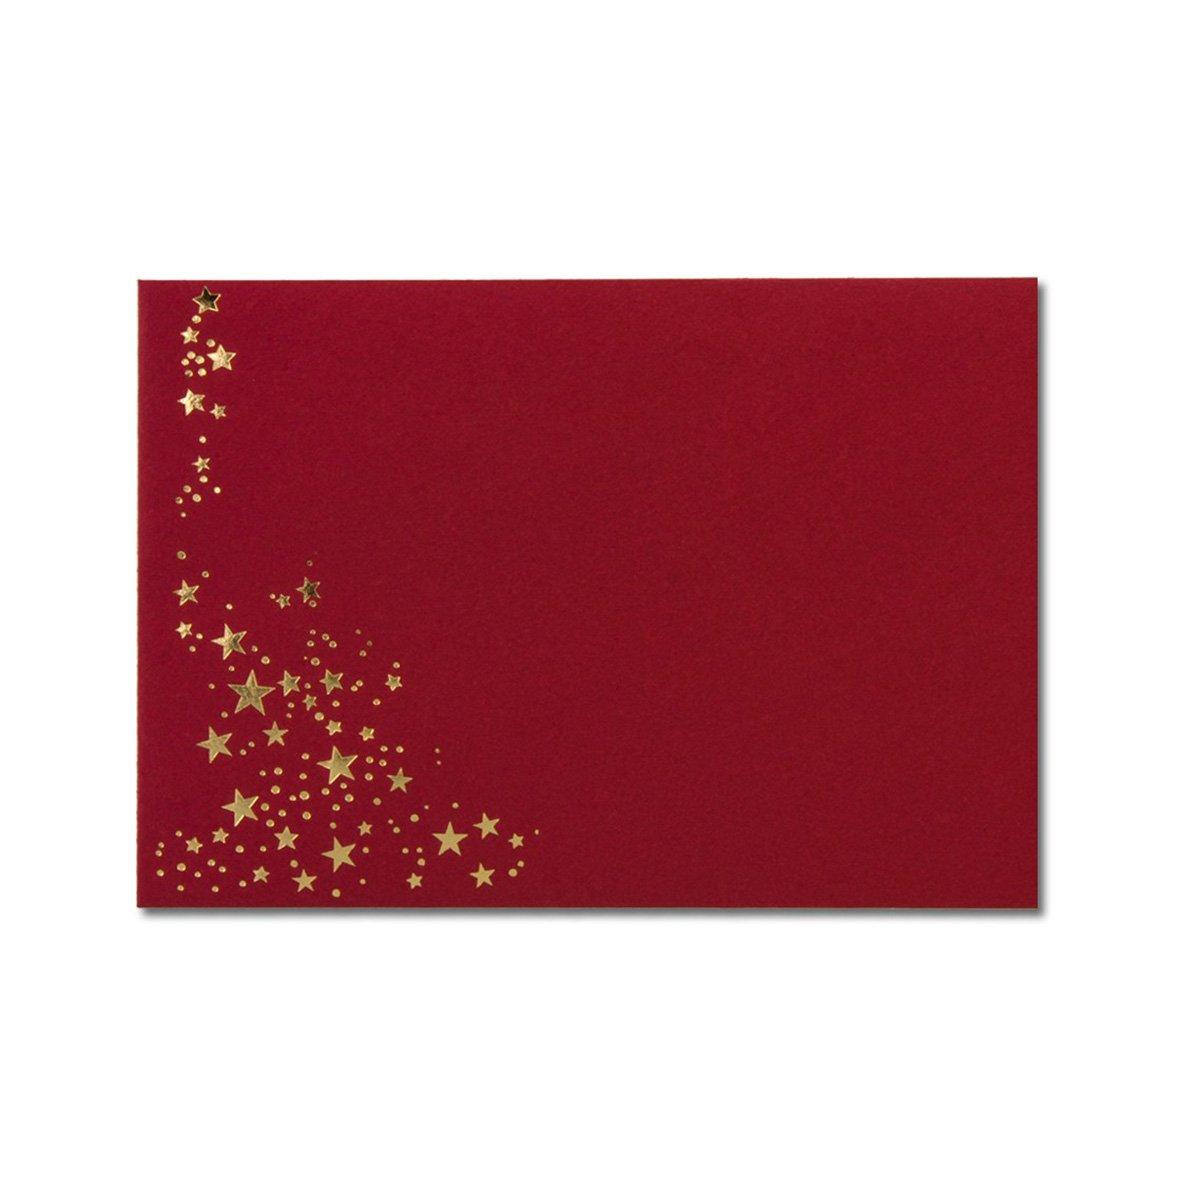 Buste natalizie, pellicola con stelle DIN C6 - 100 Stü ck Umschlag Rot // Sterne Gold pellicola con stelle DIN C6 - 100 Stück Umschlag Rot // Sterne Gold Neuser